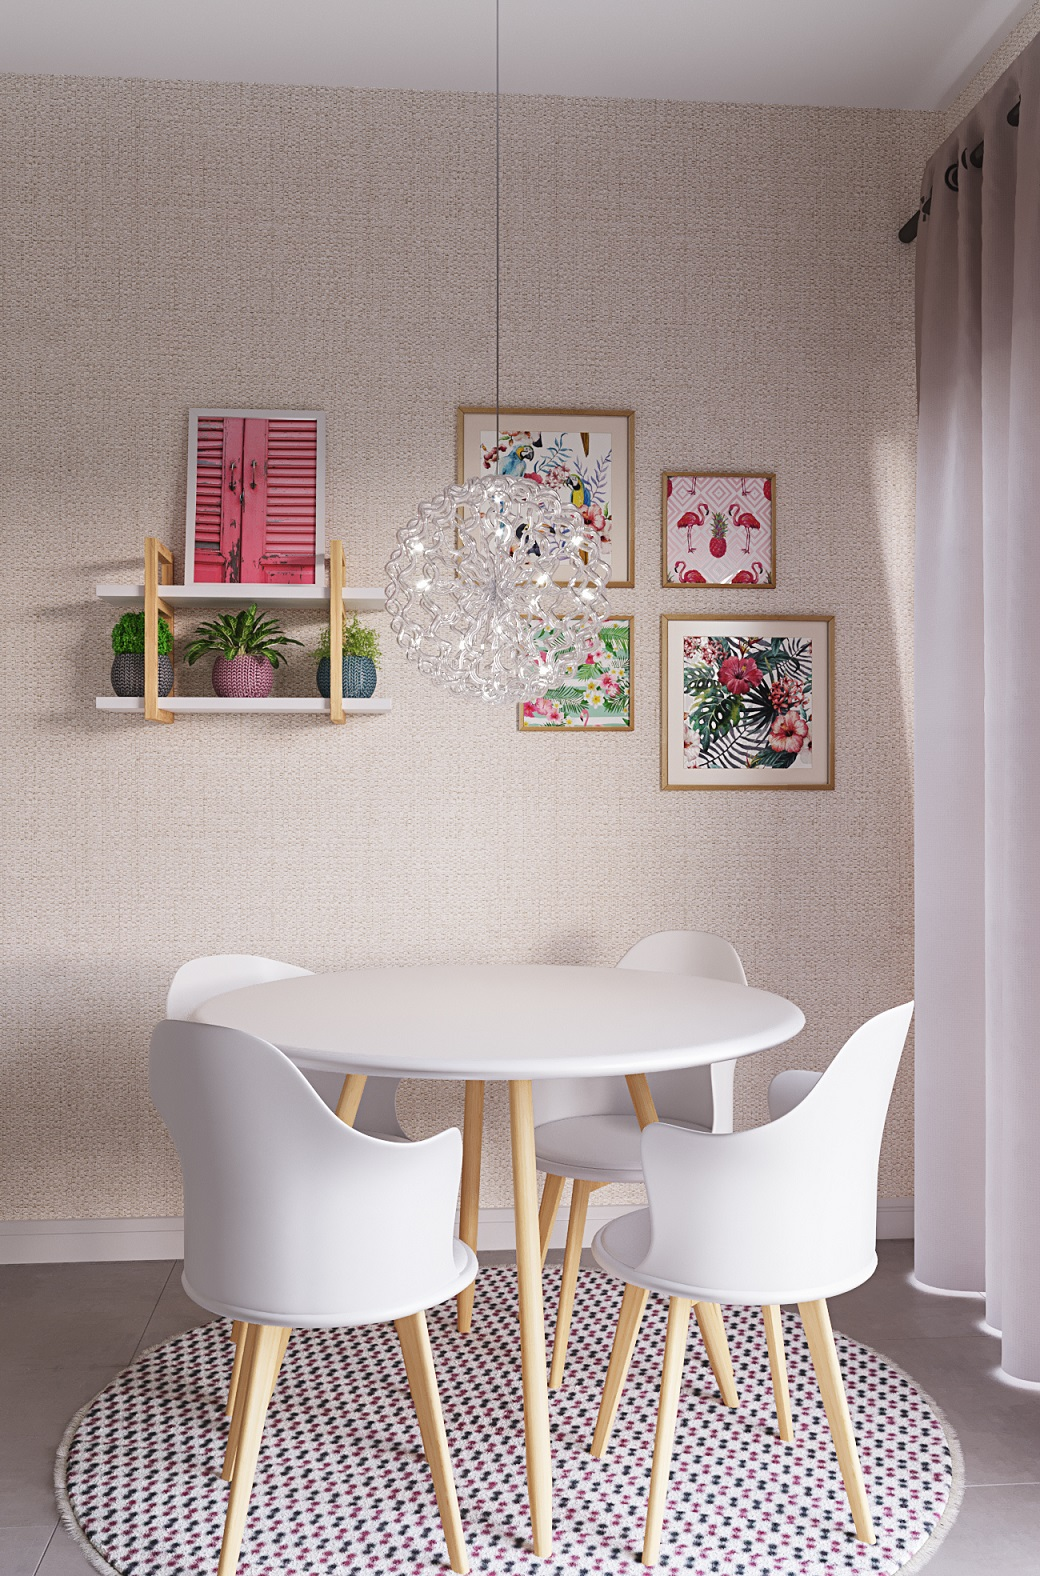 Sala De Jantar Pequena Decorada Leroy Merlin -> Casa Sala De Tv Sala De Jantar A Fazenda